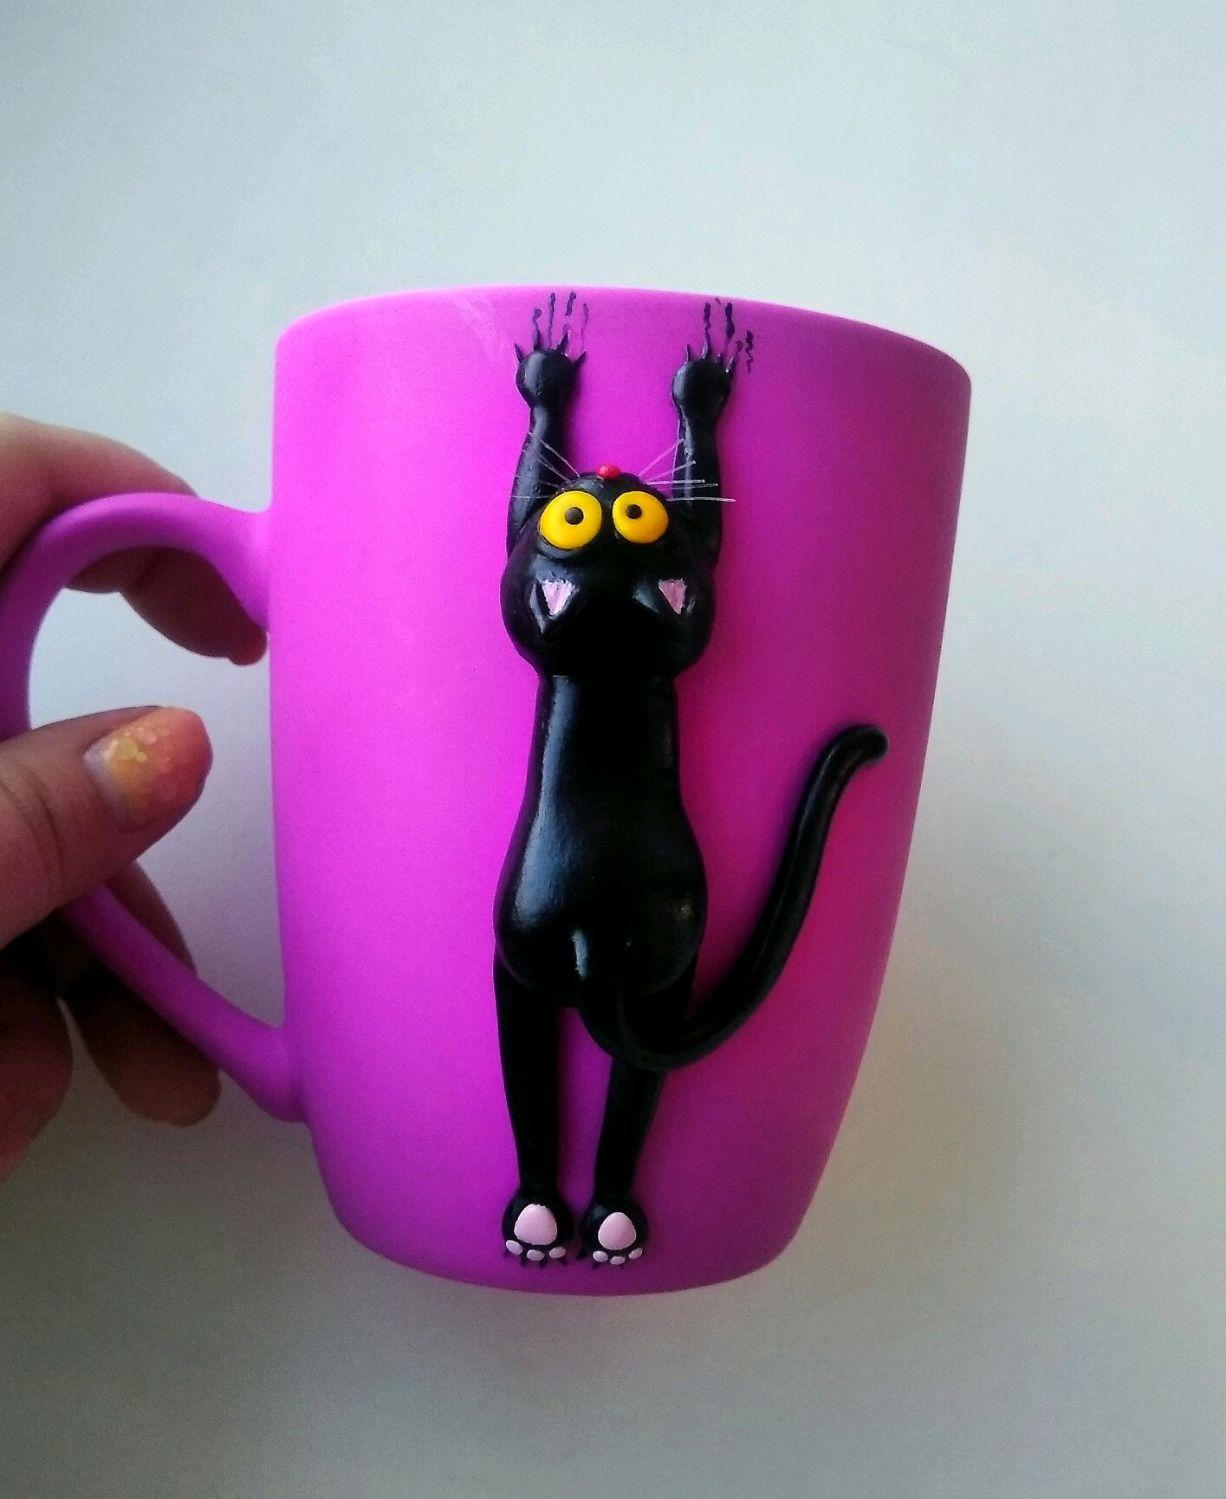 Кот на кружке, Кружки и чашки, Волжский,  Фото №1